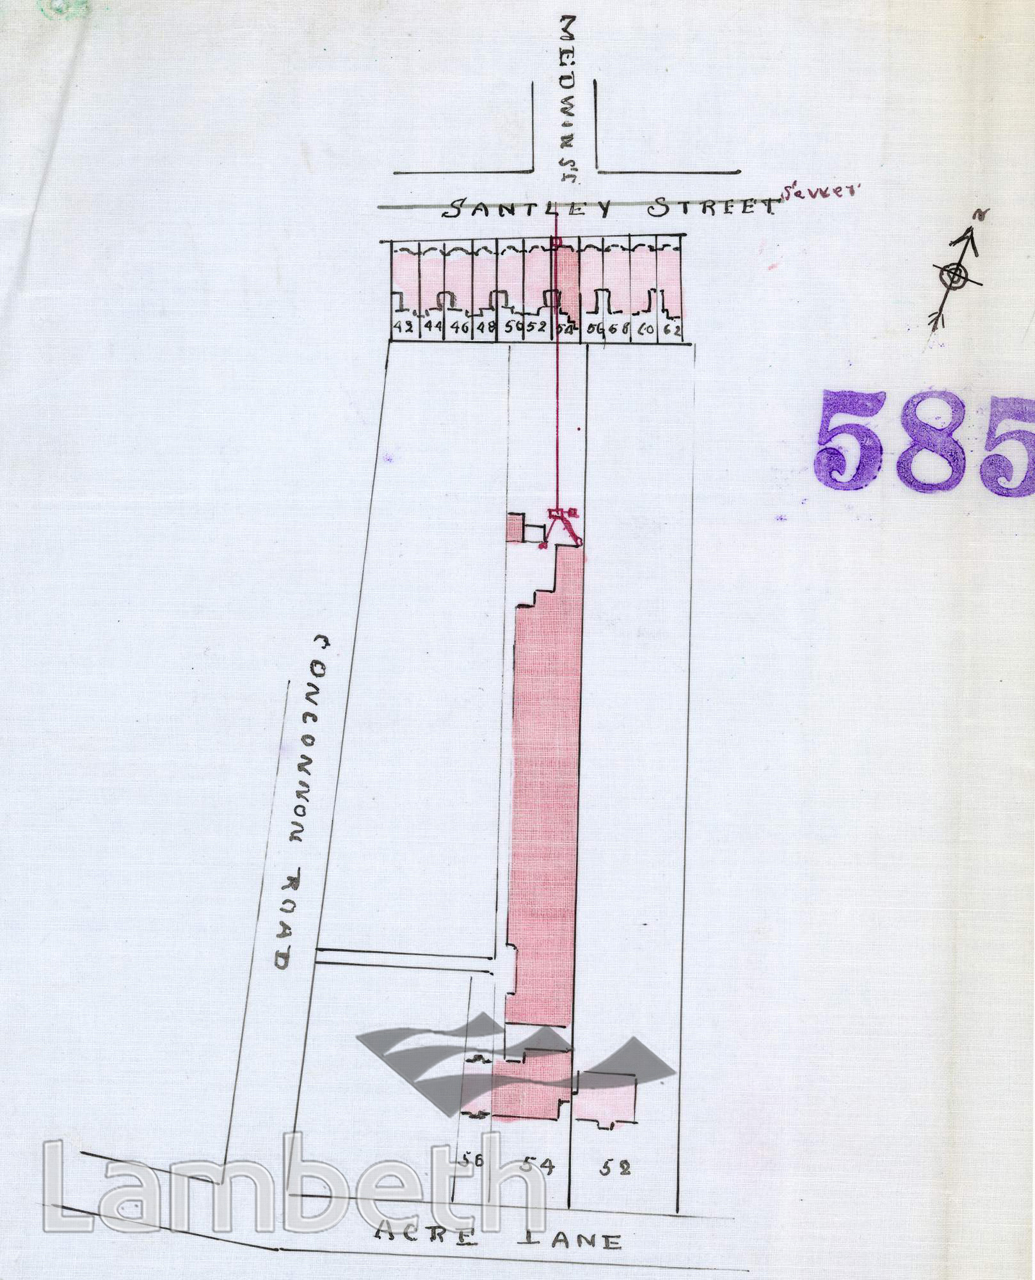 BELVEDERE LODGE LAUNDRY, 54 ACRE LANE, BRIXTON